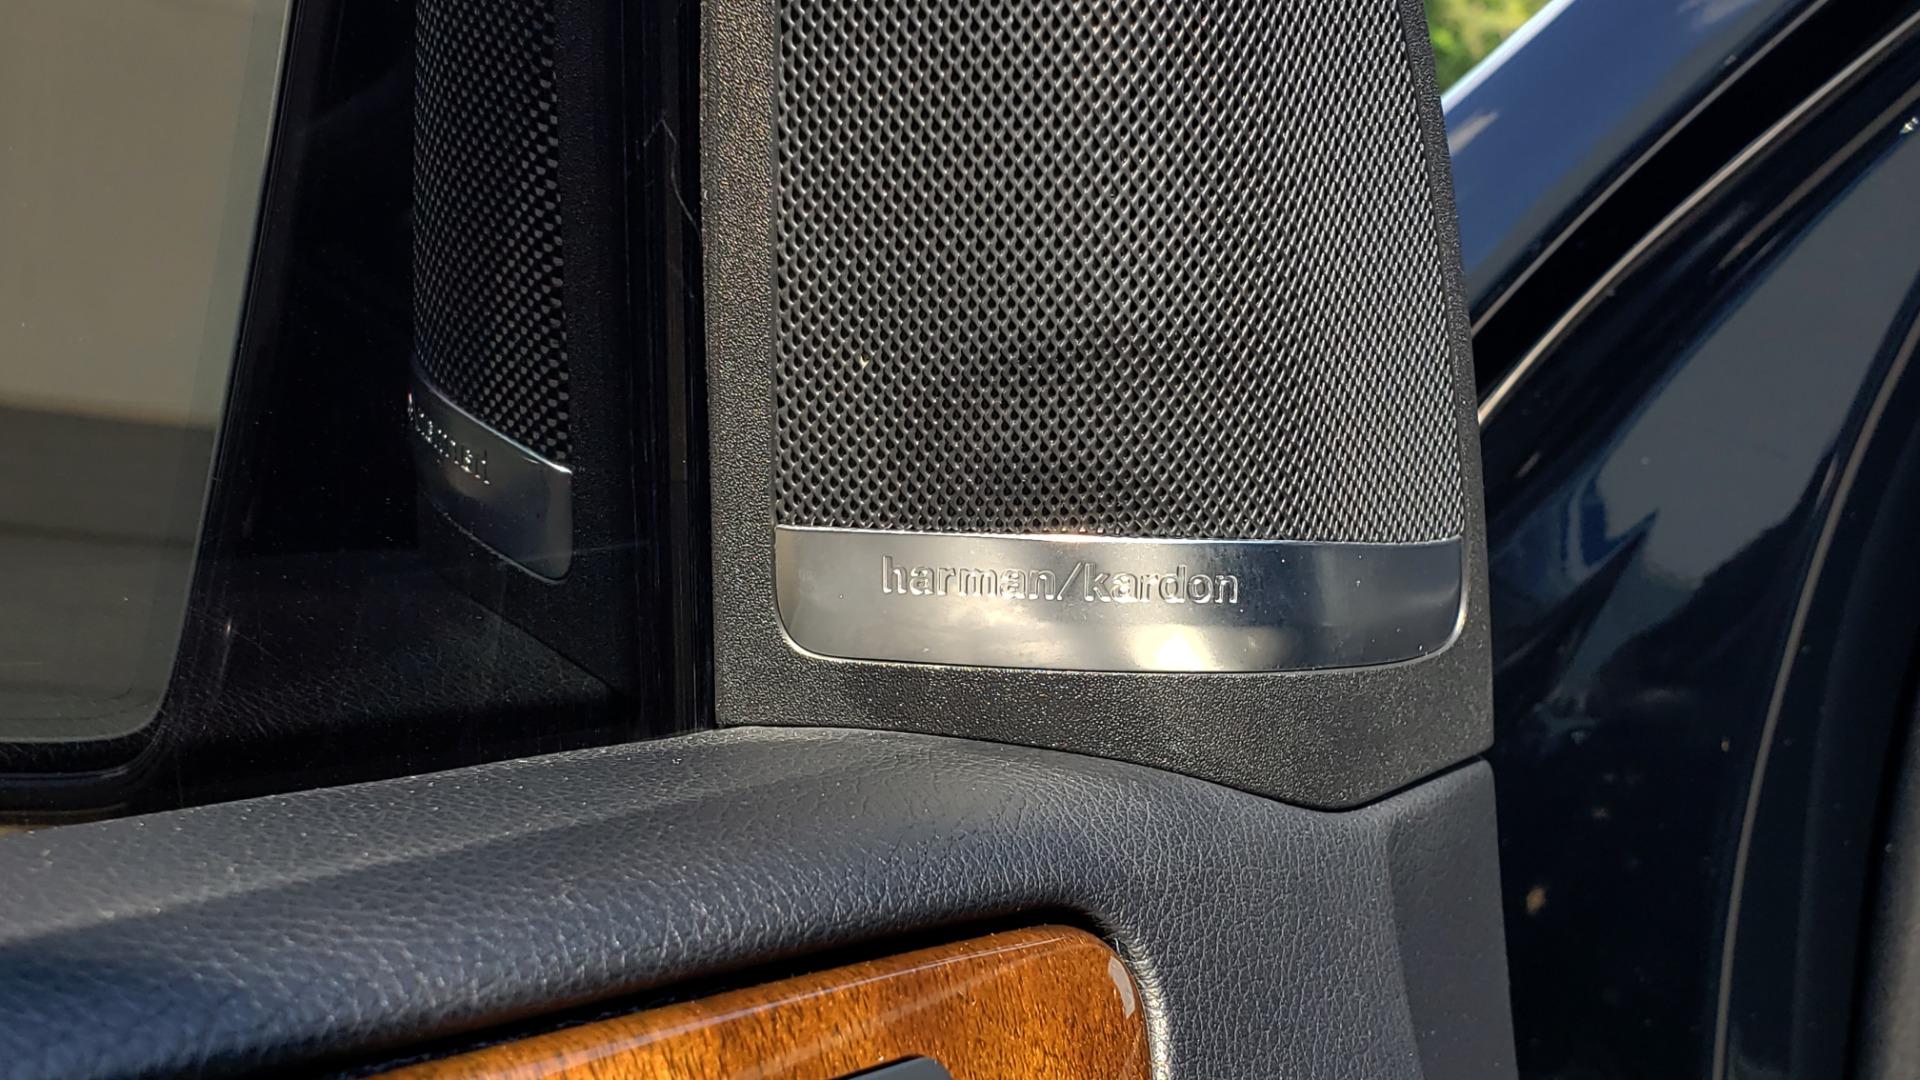 Used 2017 Mercedes-Benz GLS GLS 550 for sale Sold at Formula Imports in Charlotte NC 28227 39